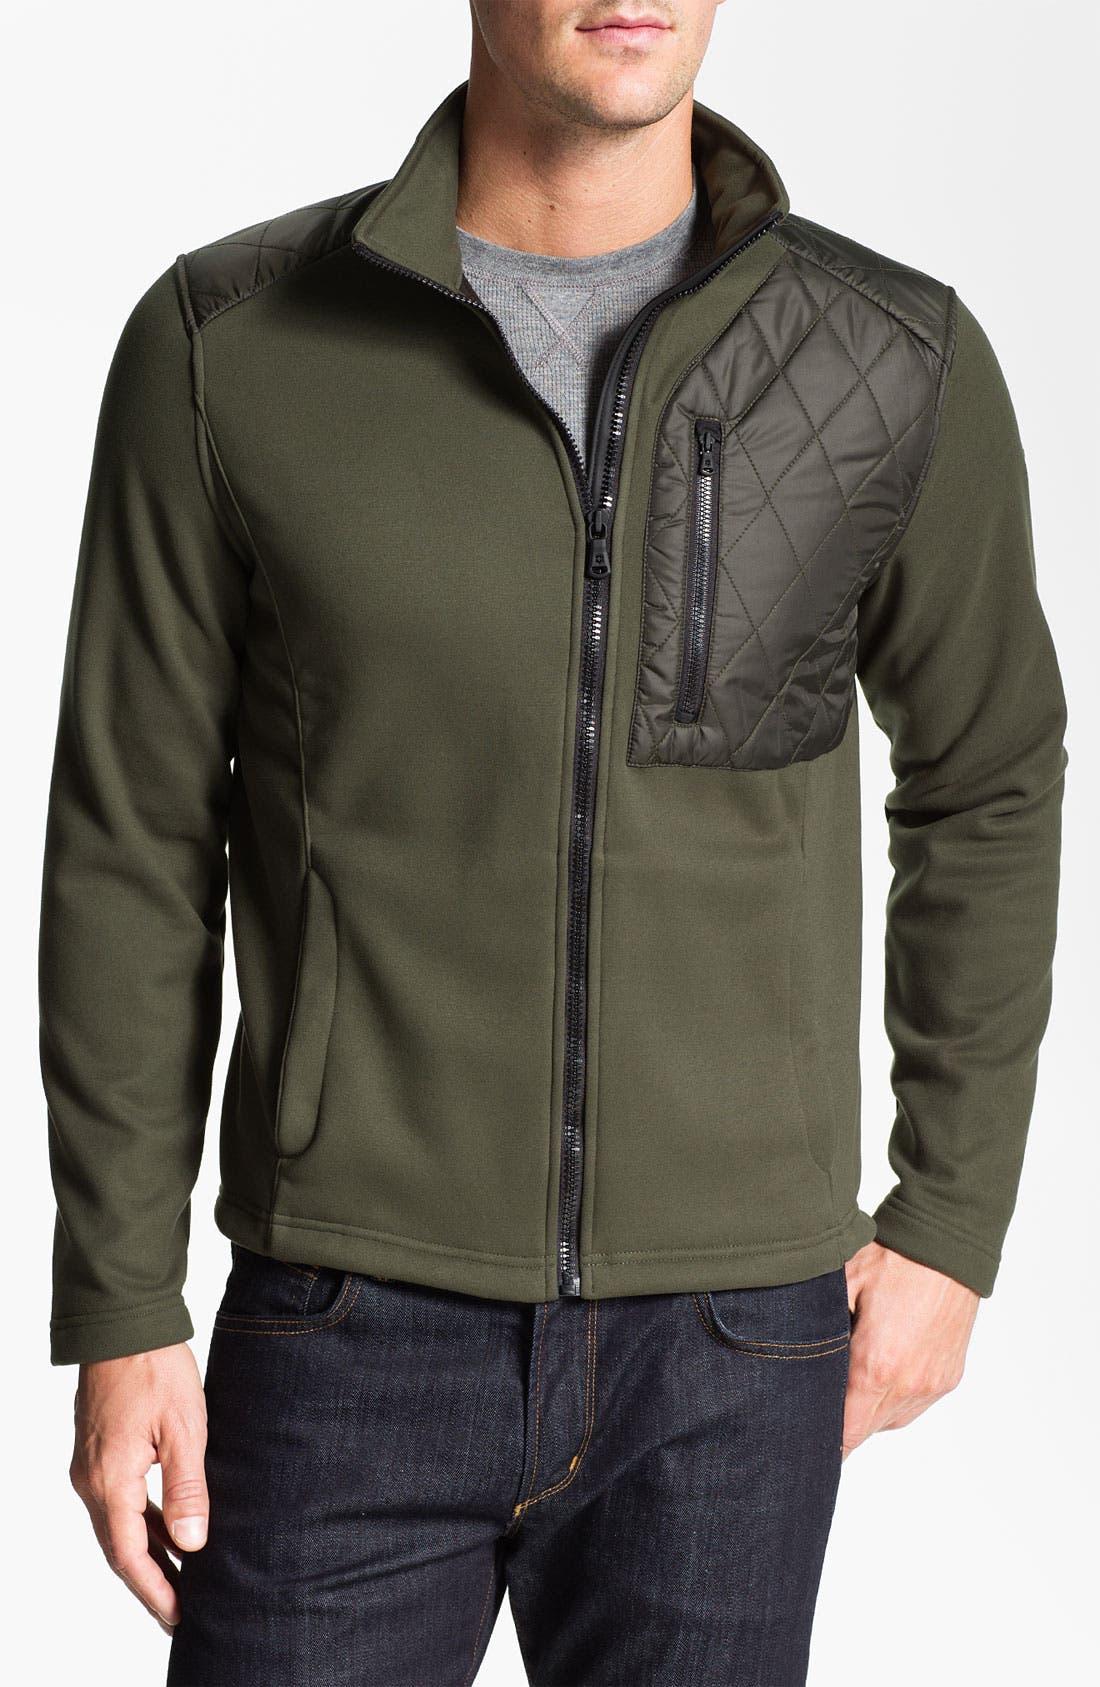 Alternate Image 1 Selected - Victorinox Swiss Army® 'Niston' Fleece Jacket (Online Exclusive)